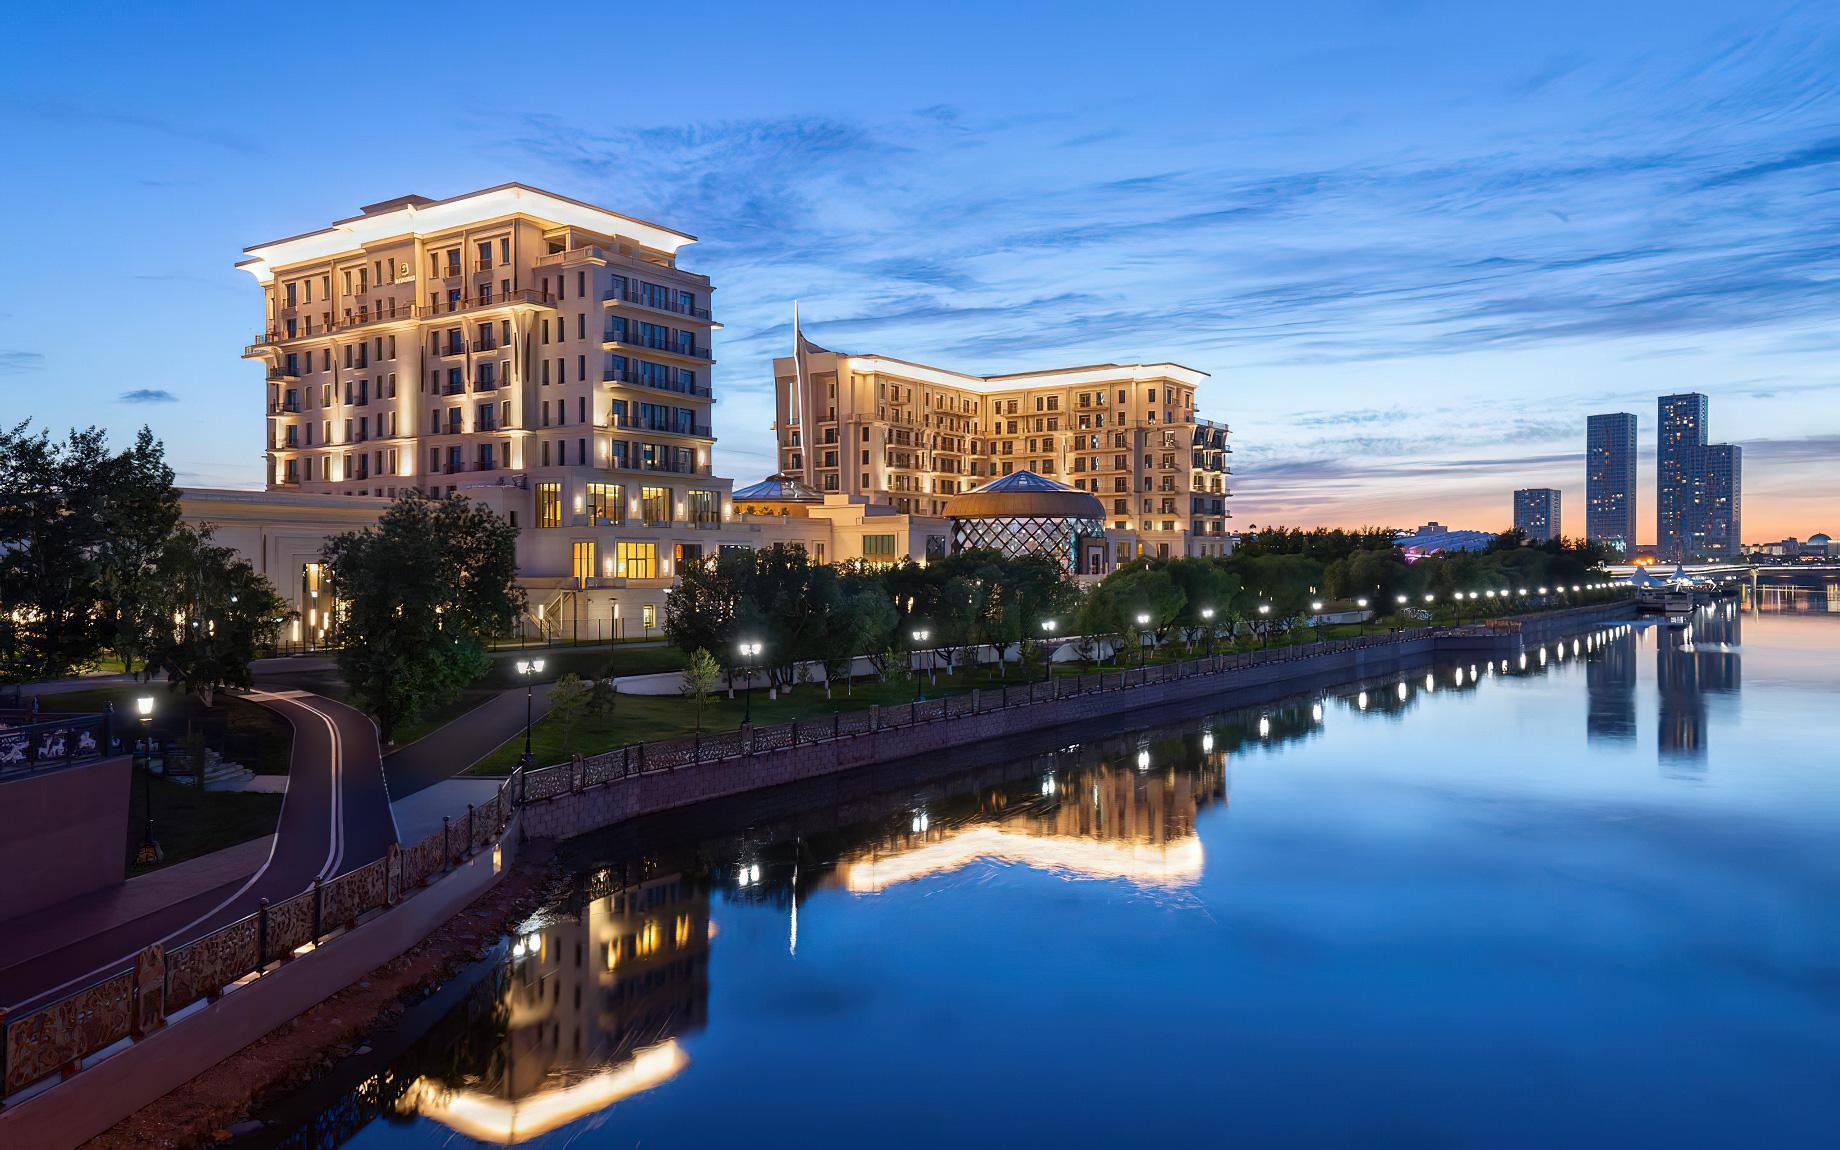 The St. Regis Astana Luxury Hotel - Astana, Kazakhstan - Hotel River View Night